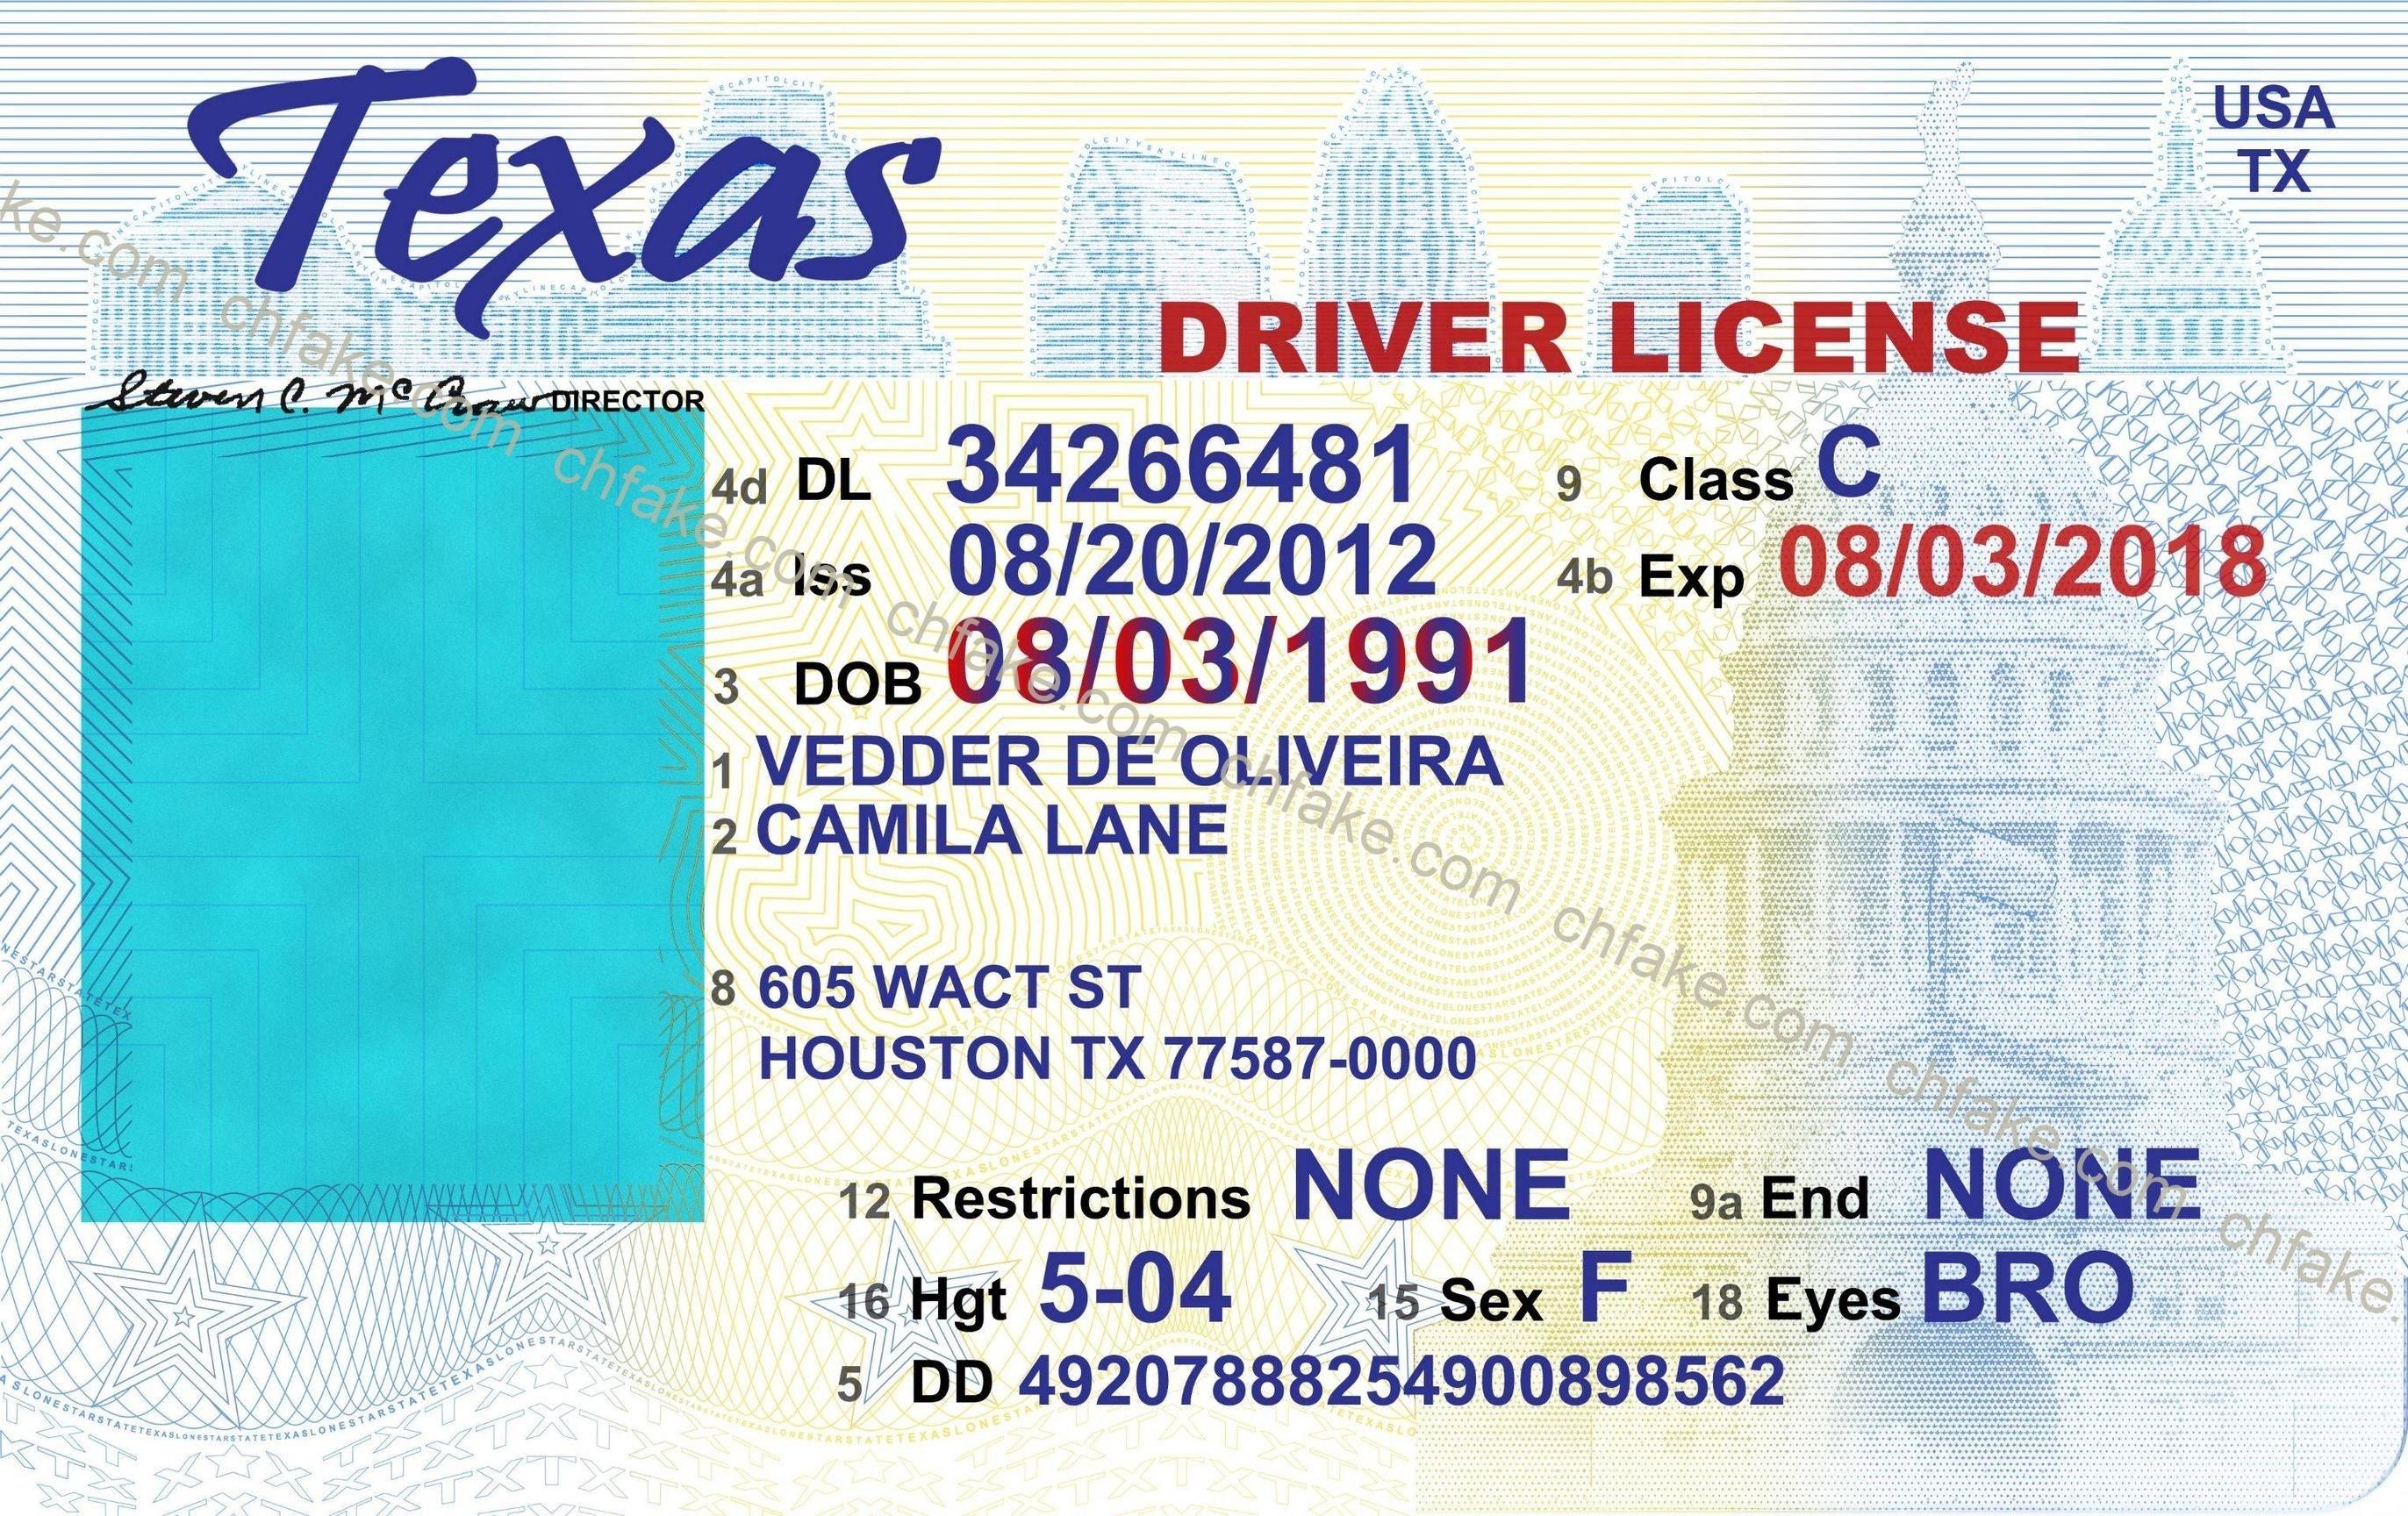 Drivers License Fake - Download Beepmunk Printable Free Texas - Free Printable Fake Drivers License